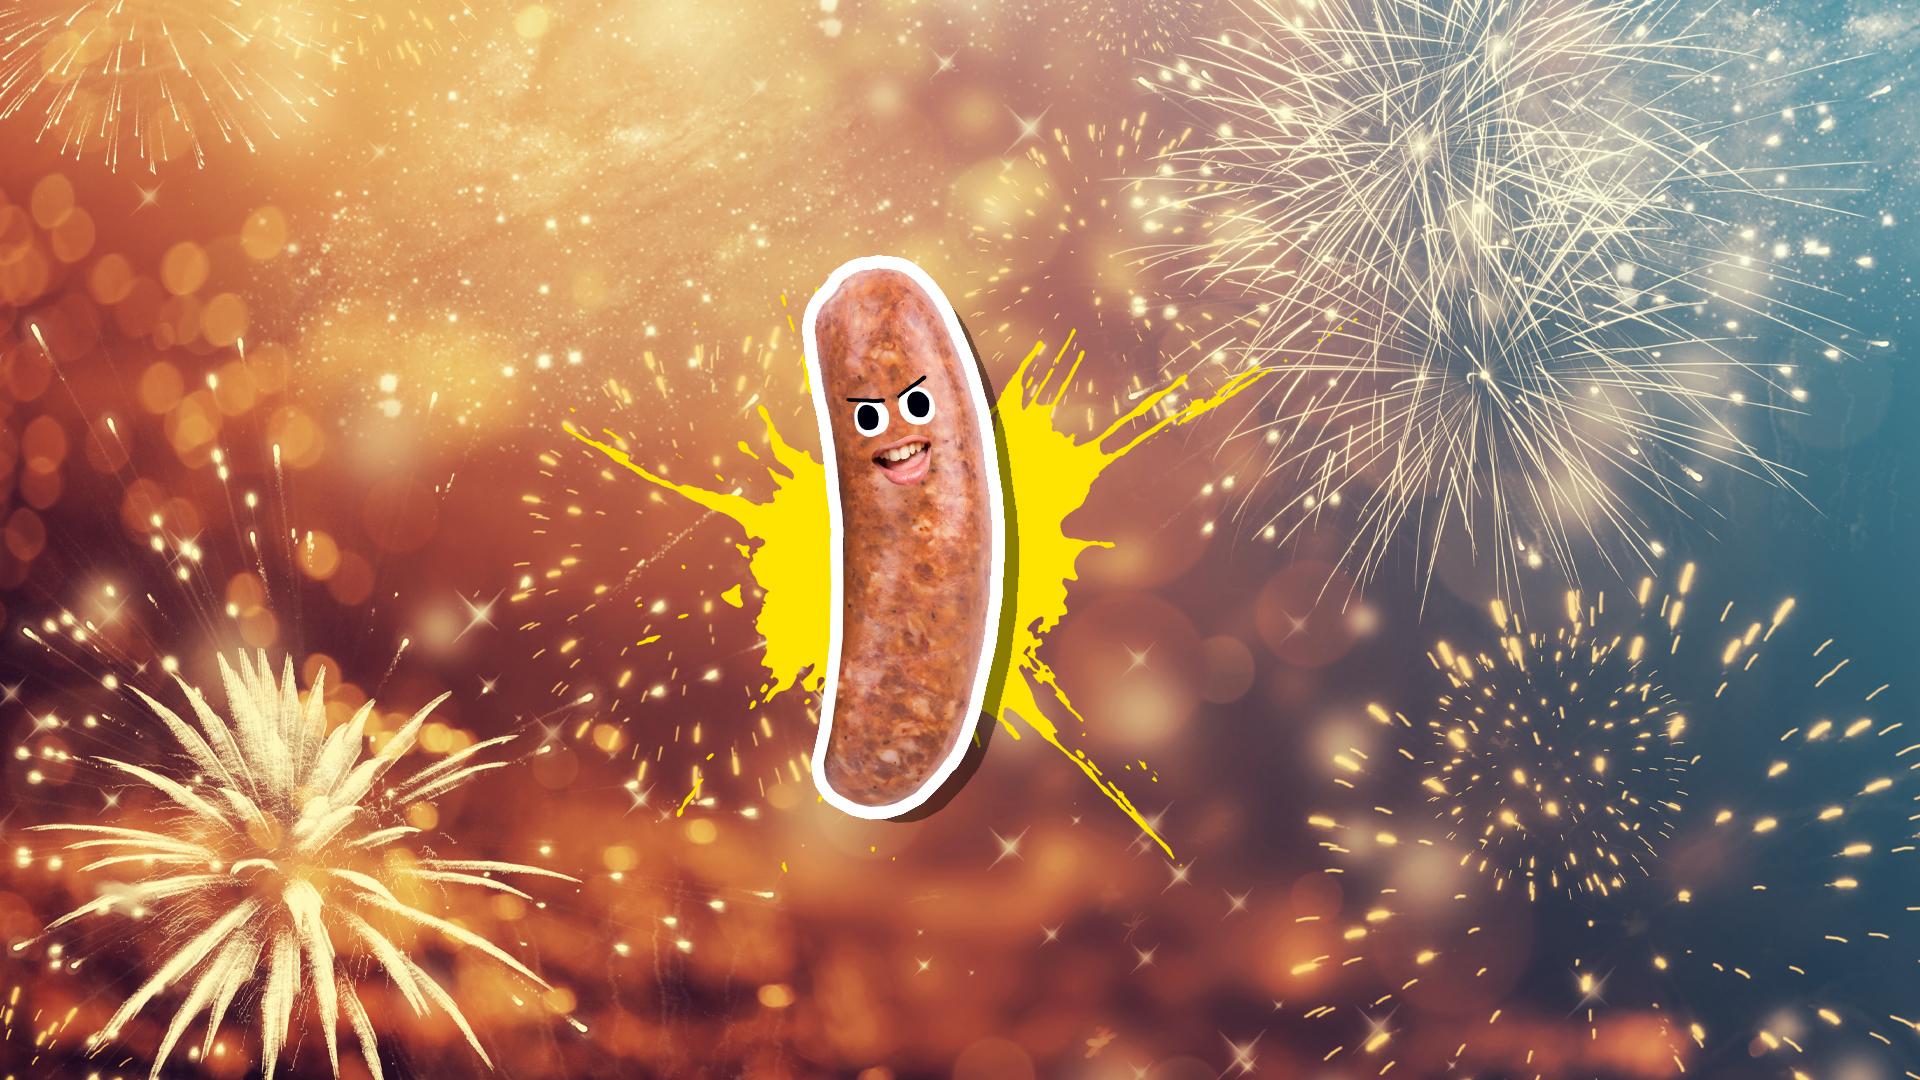 A sausage enjoying a firework display